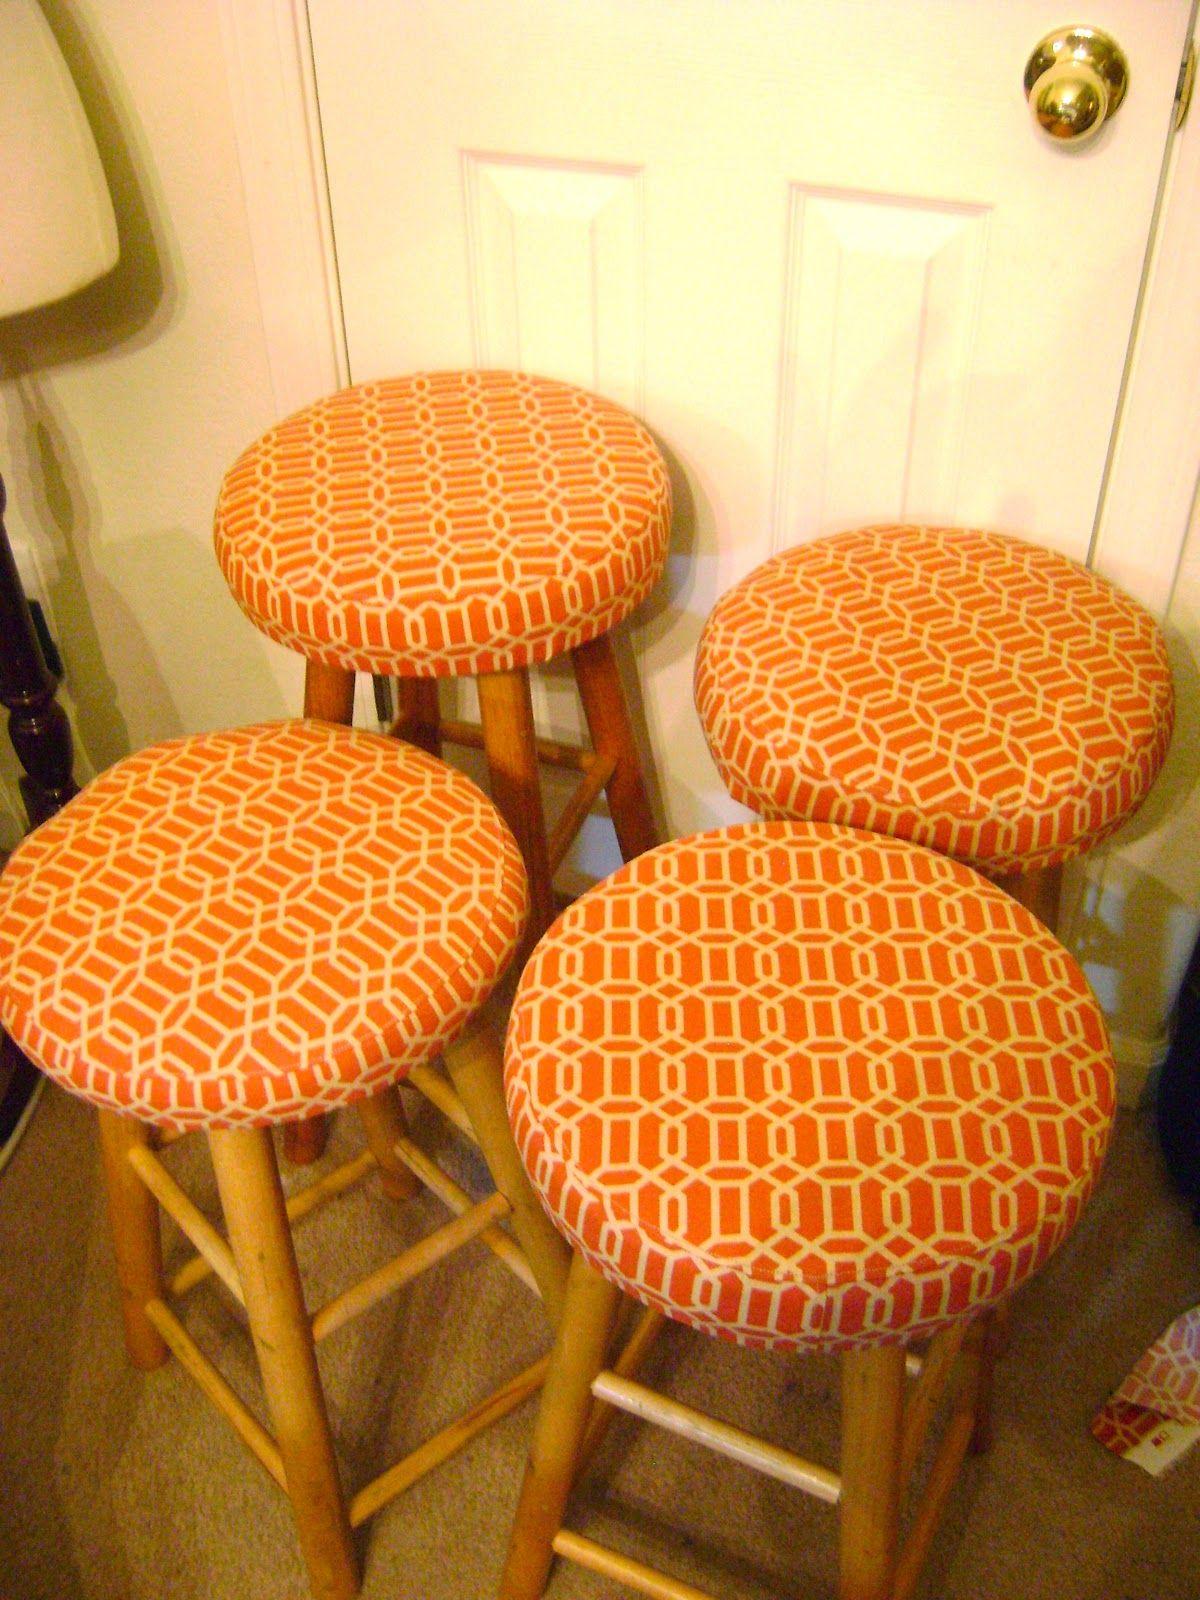 Goosegirl Sews Reupholstered Bar Stools With Tutorial